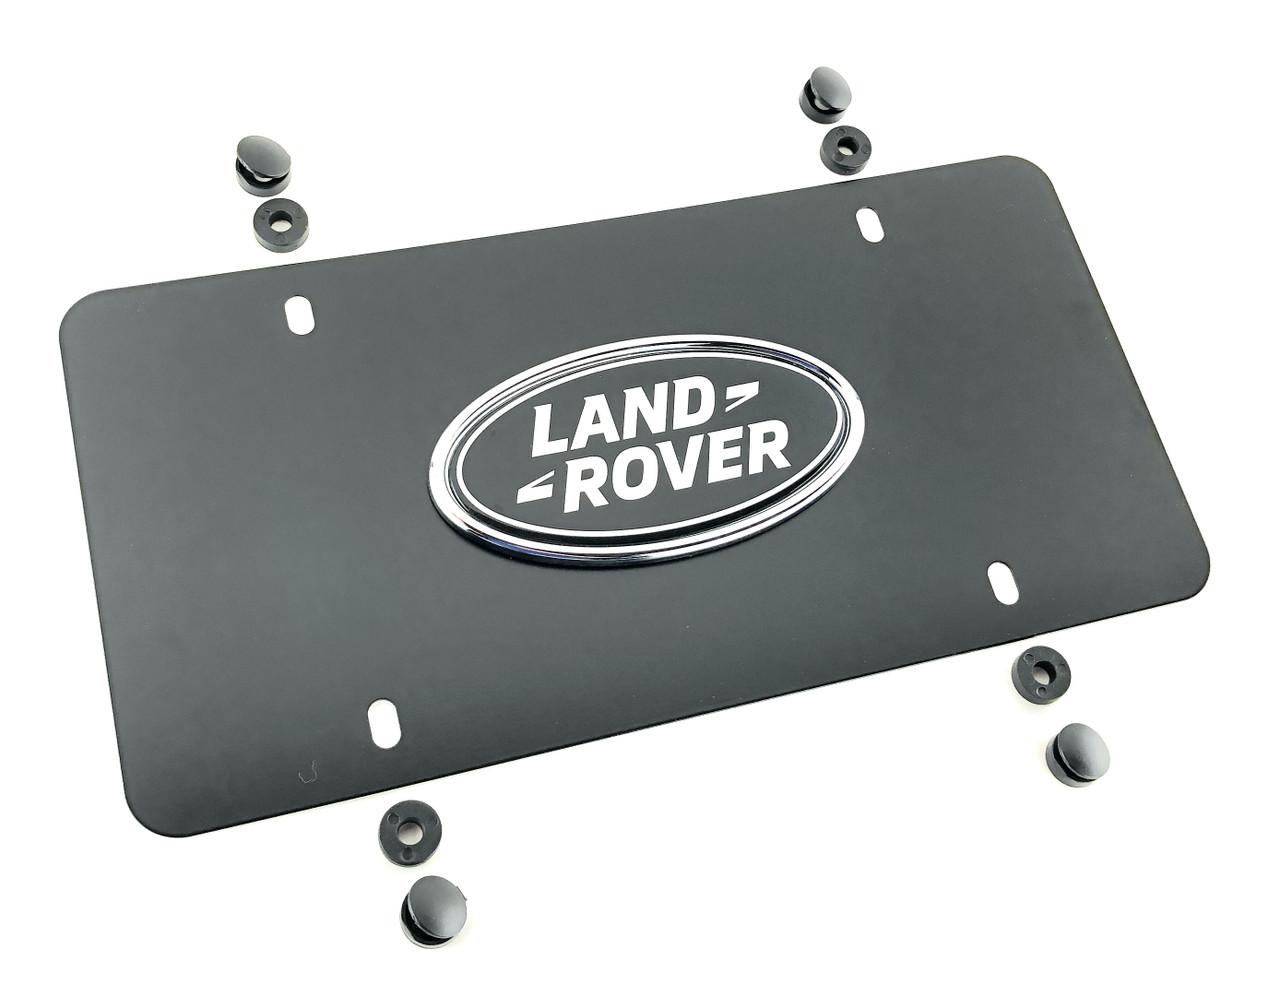 Land Rover Oval Black License Plate Insert - LR007529